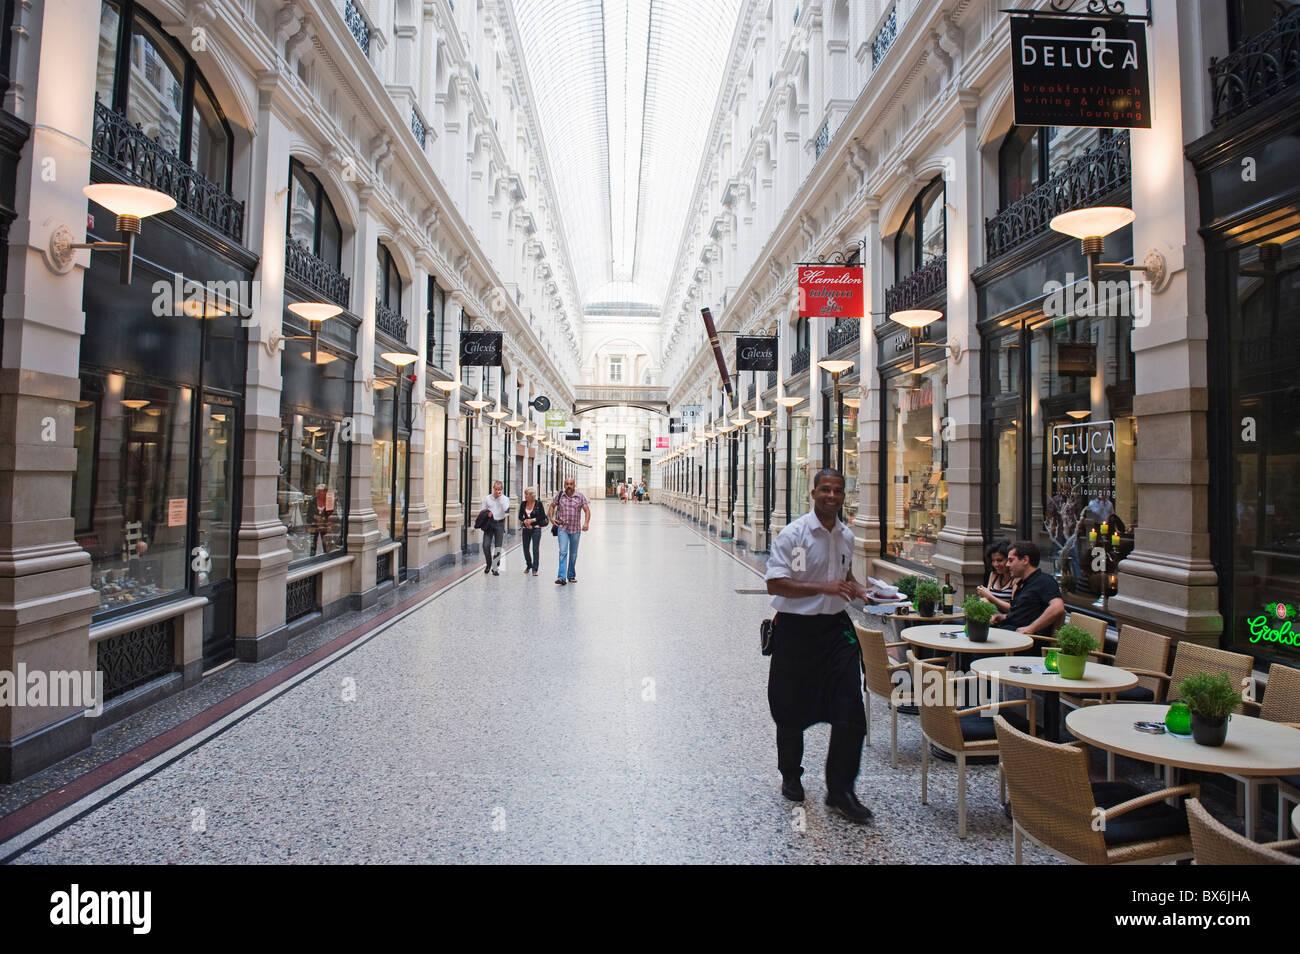 The Passage shopping arcade, Den Haag (The Hague), Netherlands, Europe Stock Photo